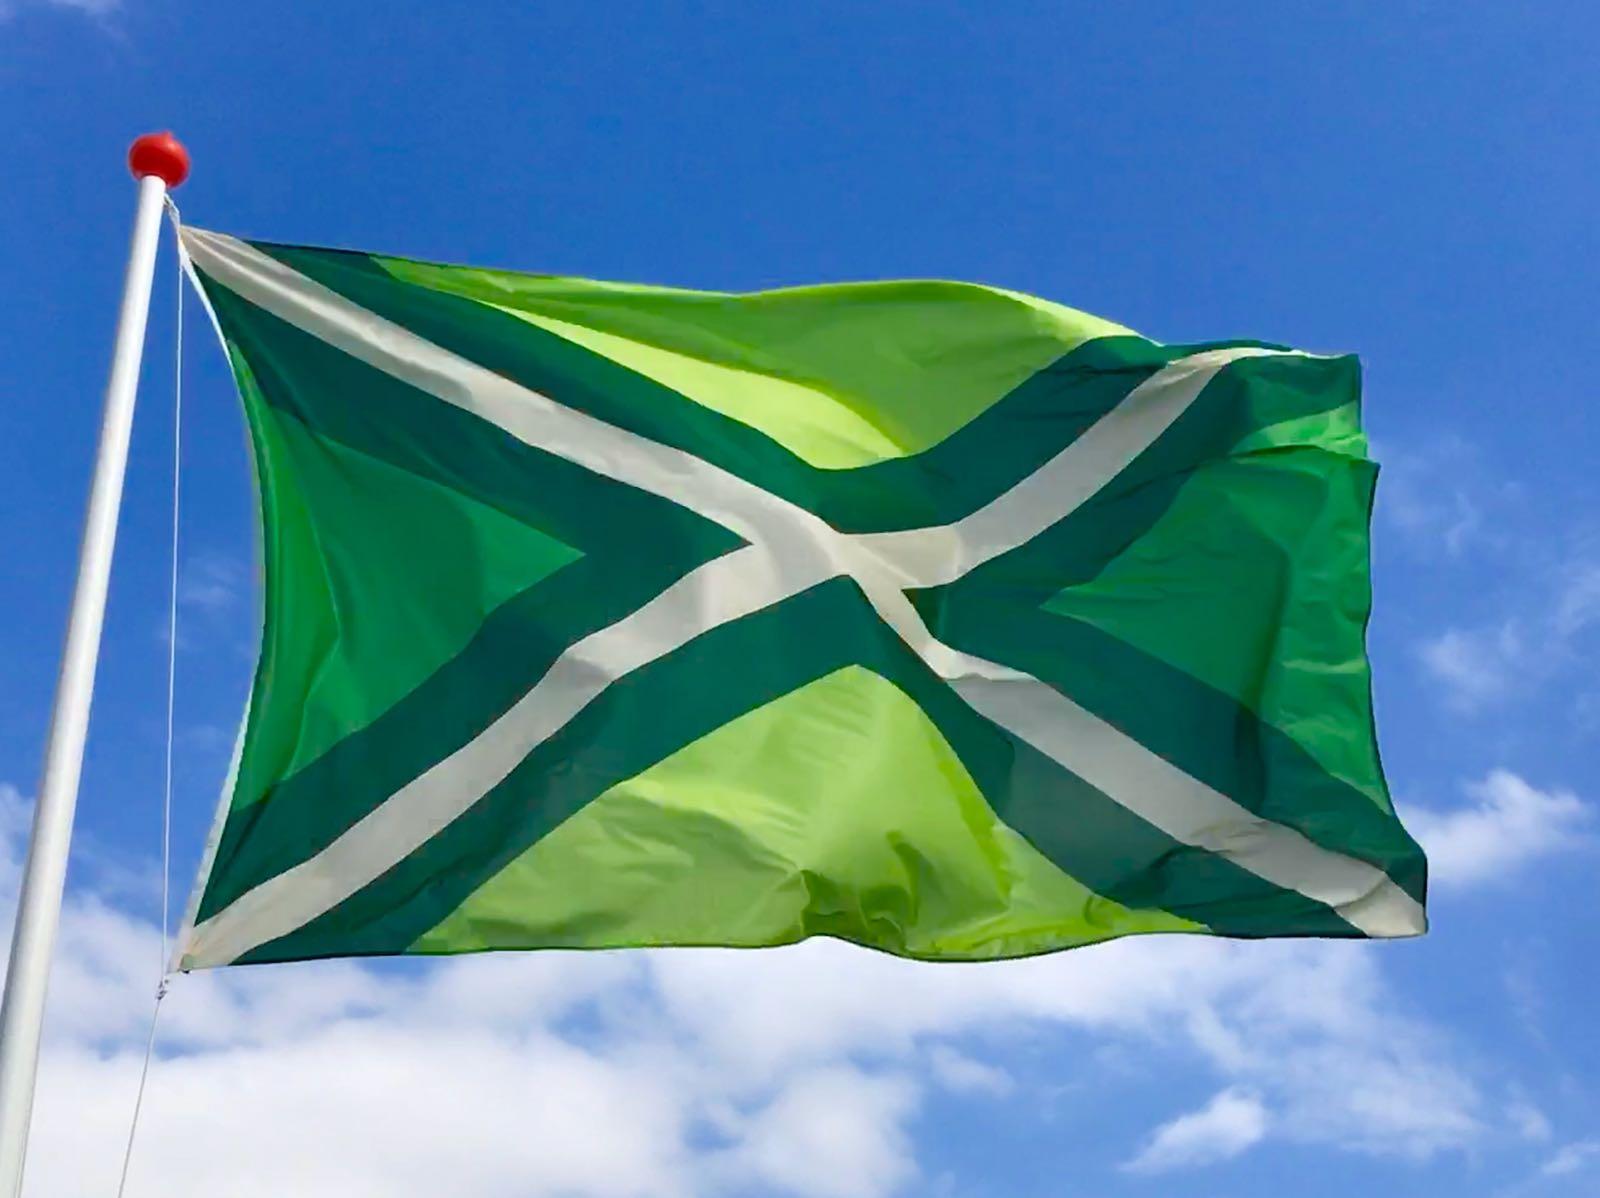 Achterhoek Regional Flag. The Netherlands, design Paul Heutinck (2018)